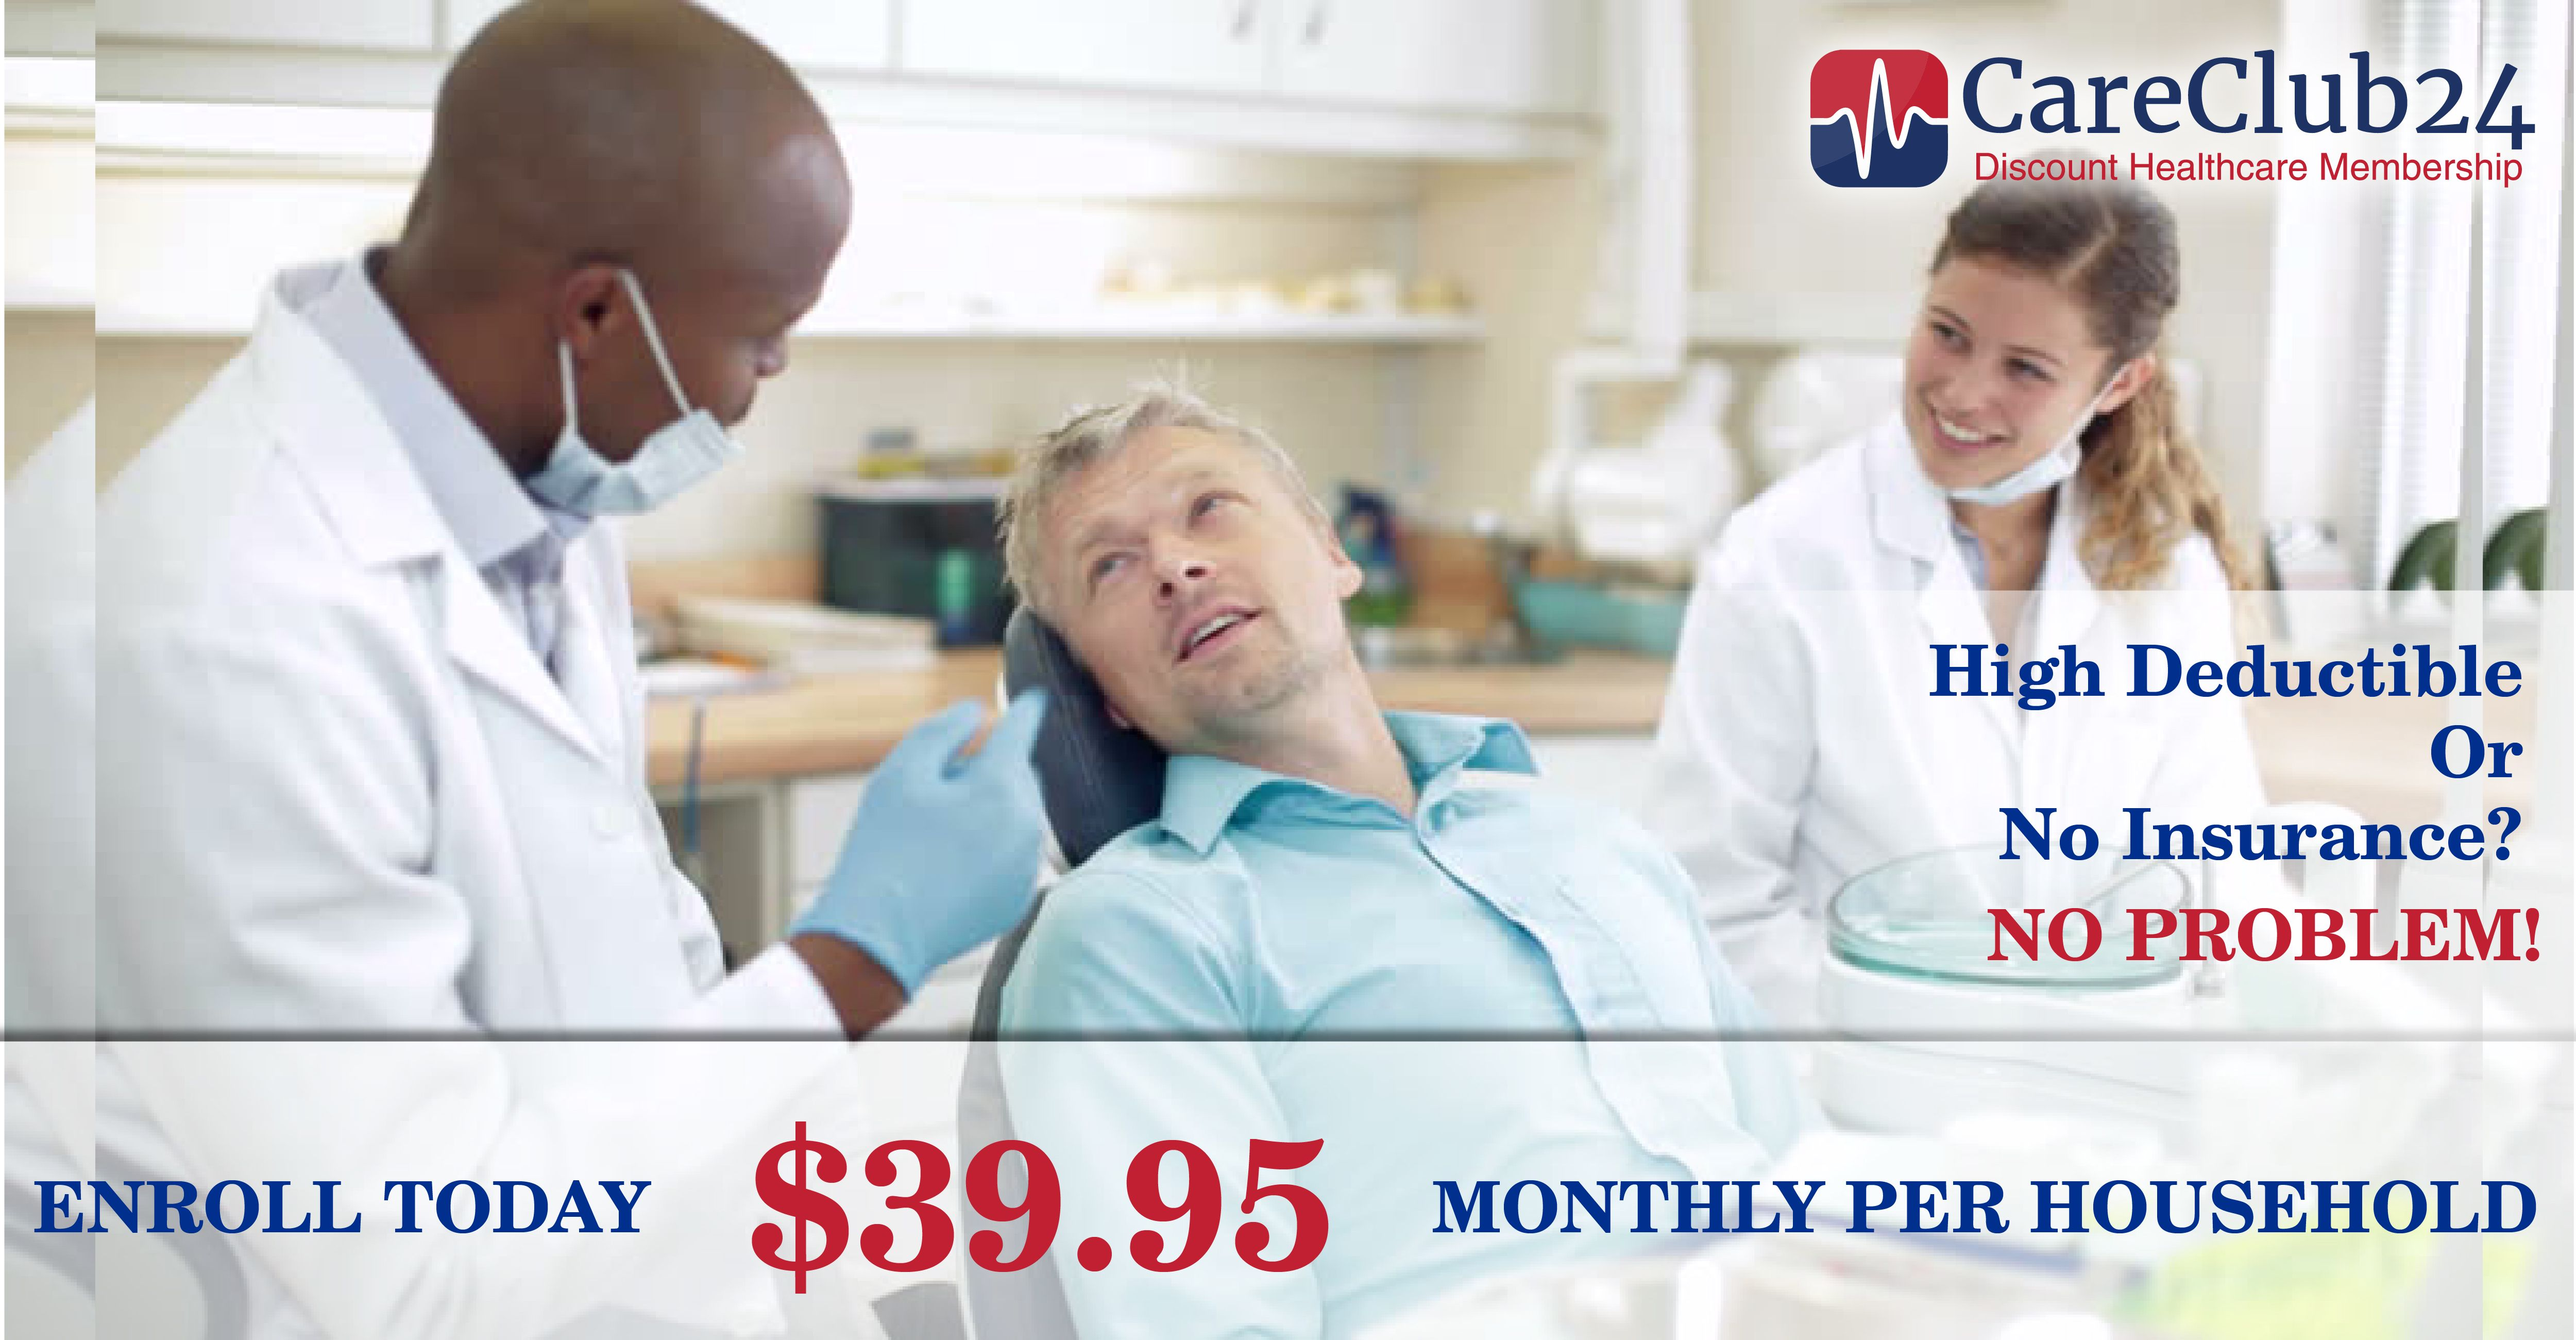 High deductible or no insurance no problem start saving